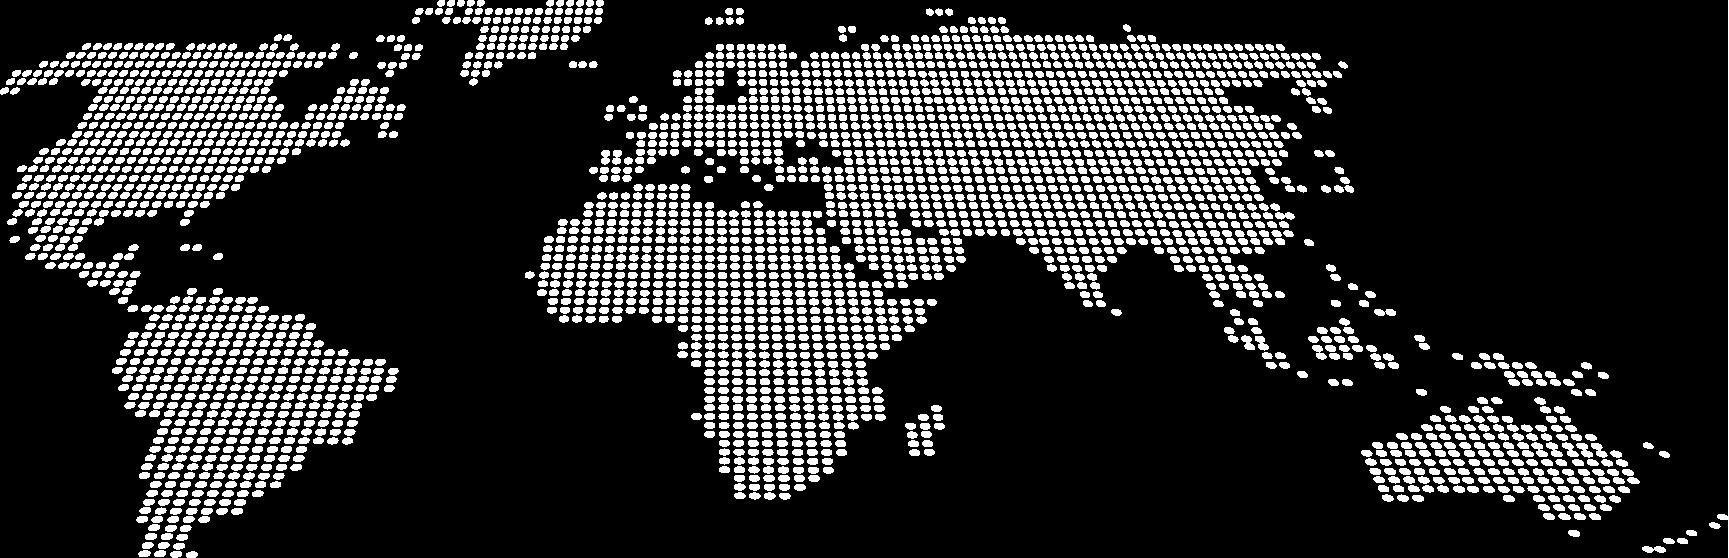 camasia-home-map